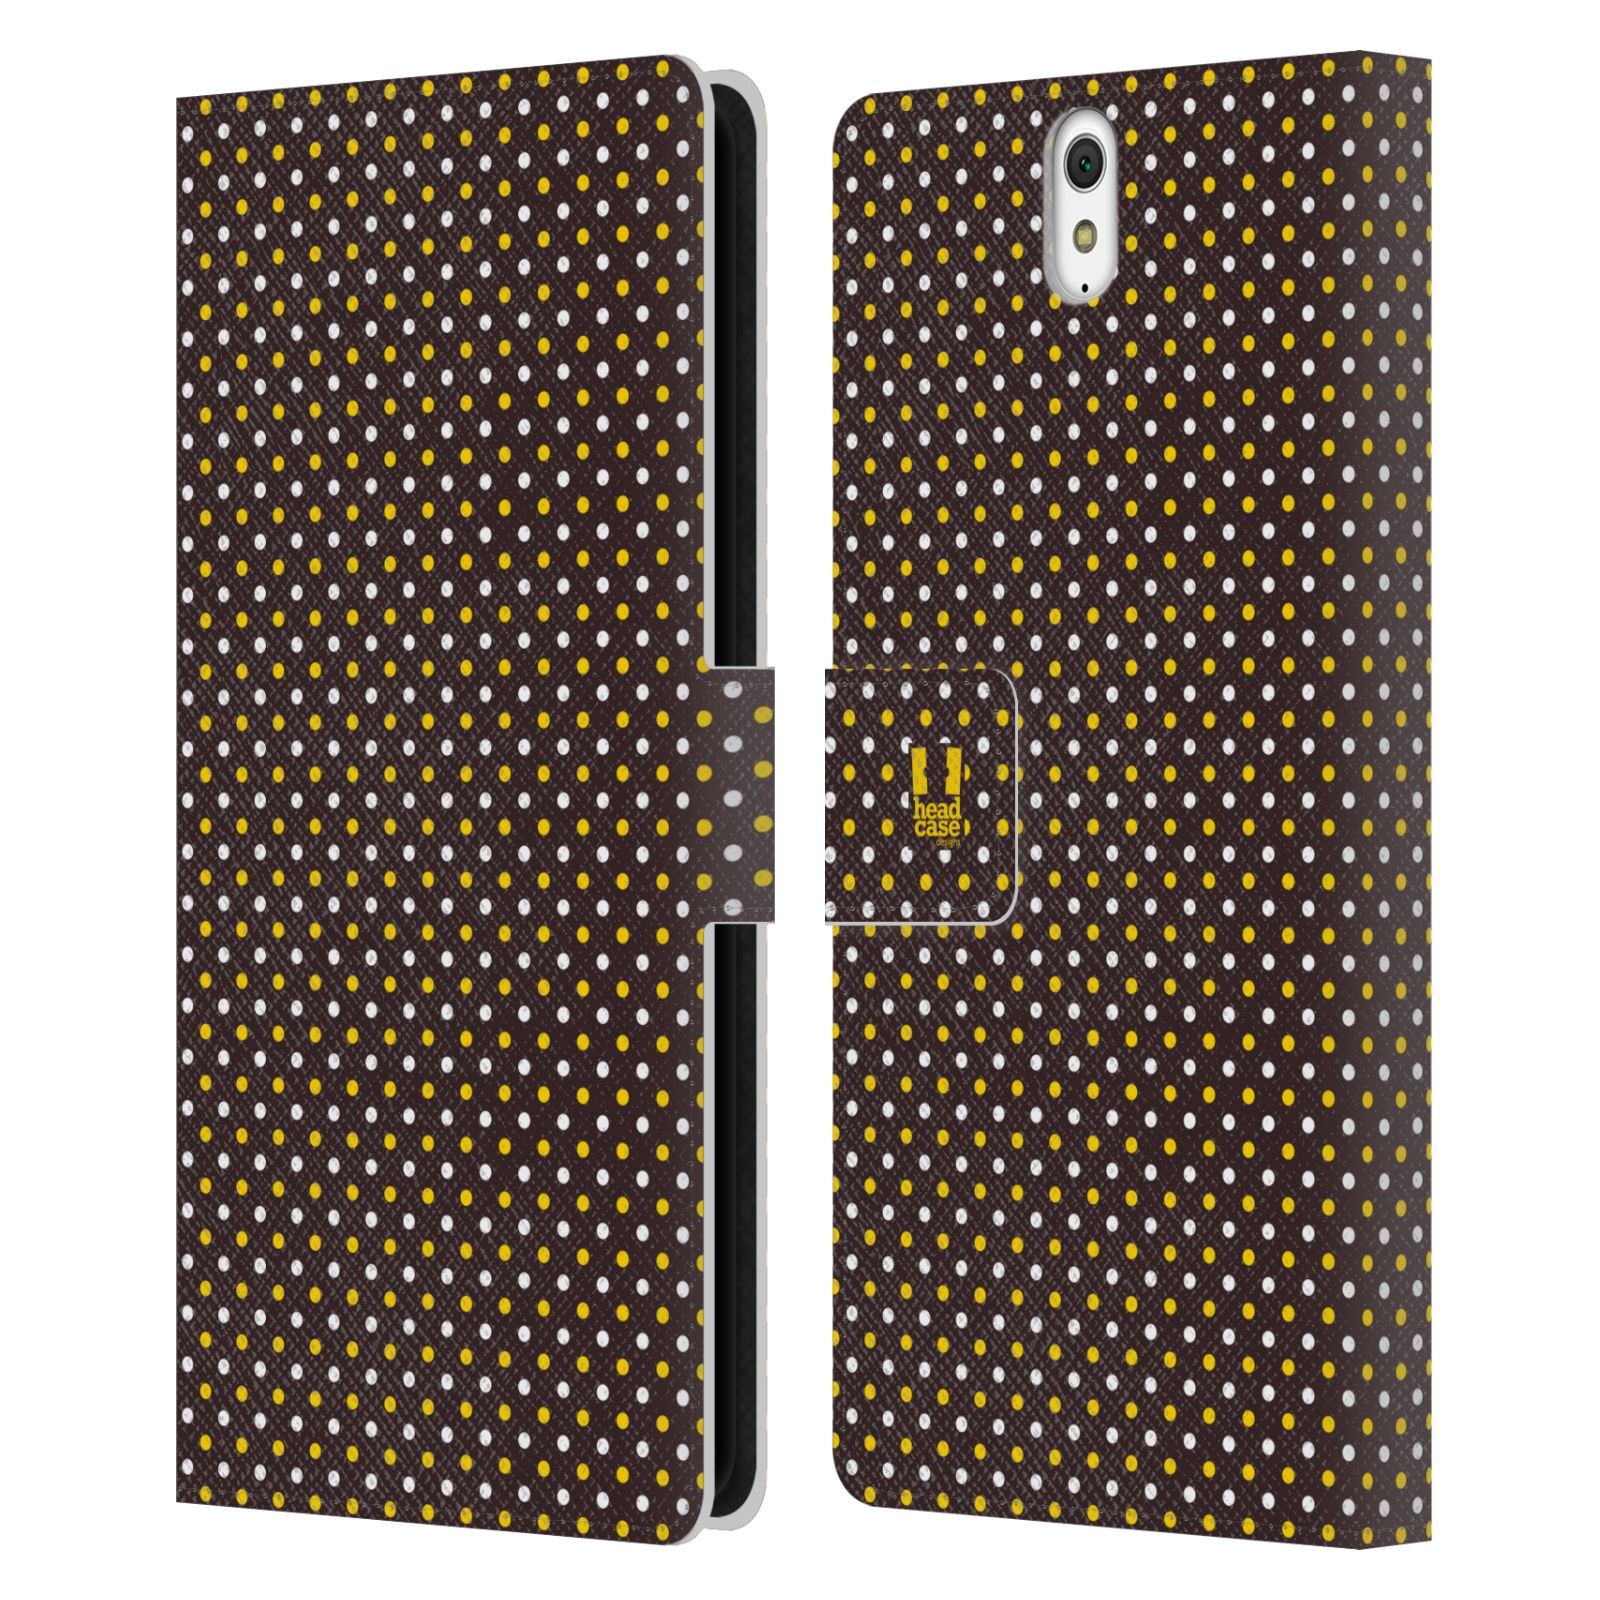 HEAD CASE Flipové pouzdro pro mobil SONY XPERIA C5 Ultra VČELÍ VZOR puntíky hnědá a žlutá